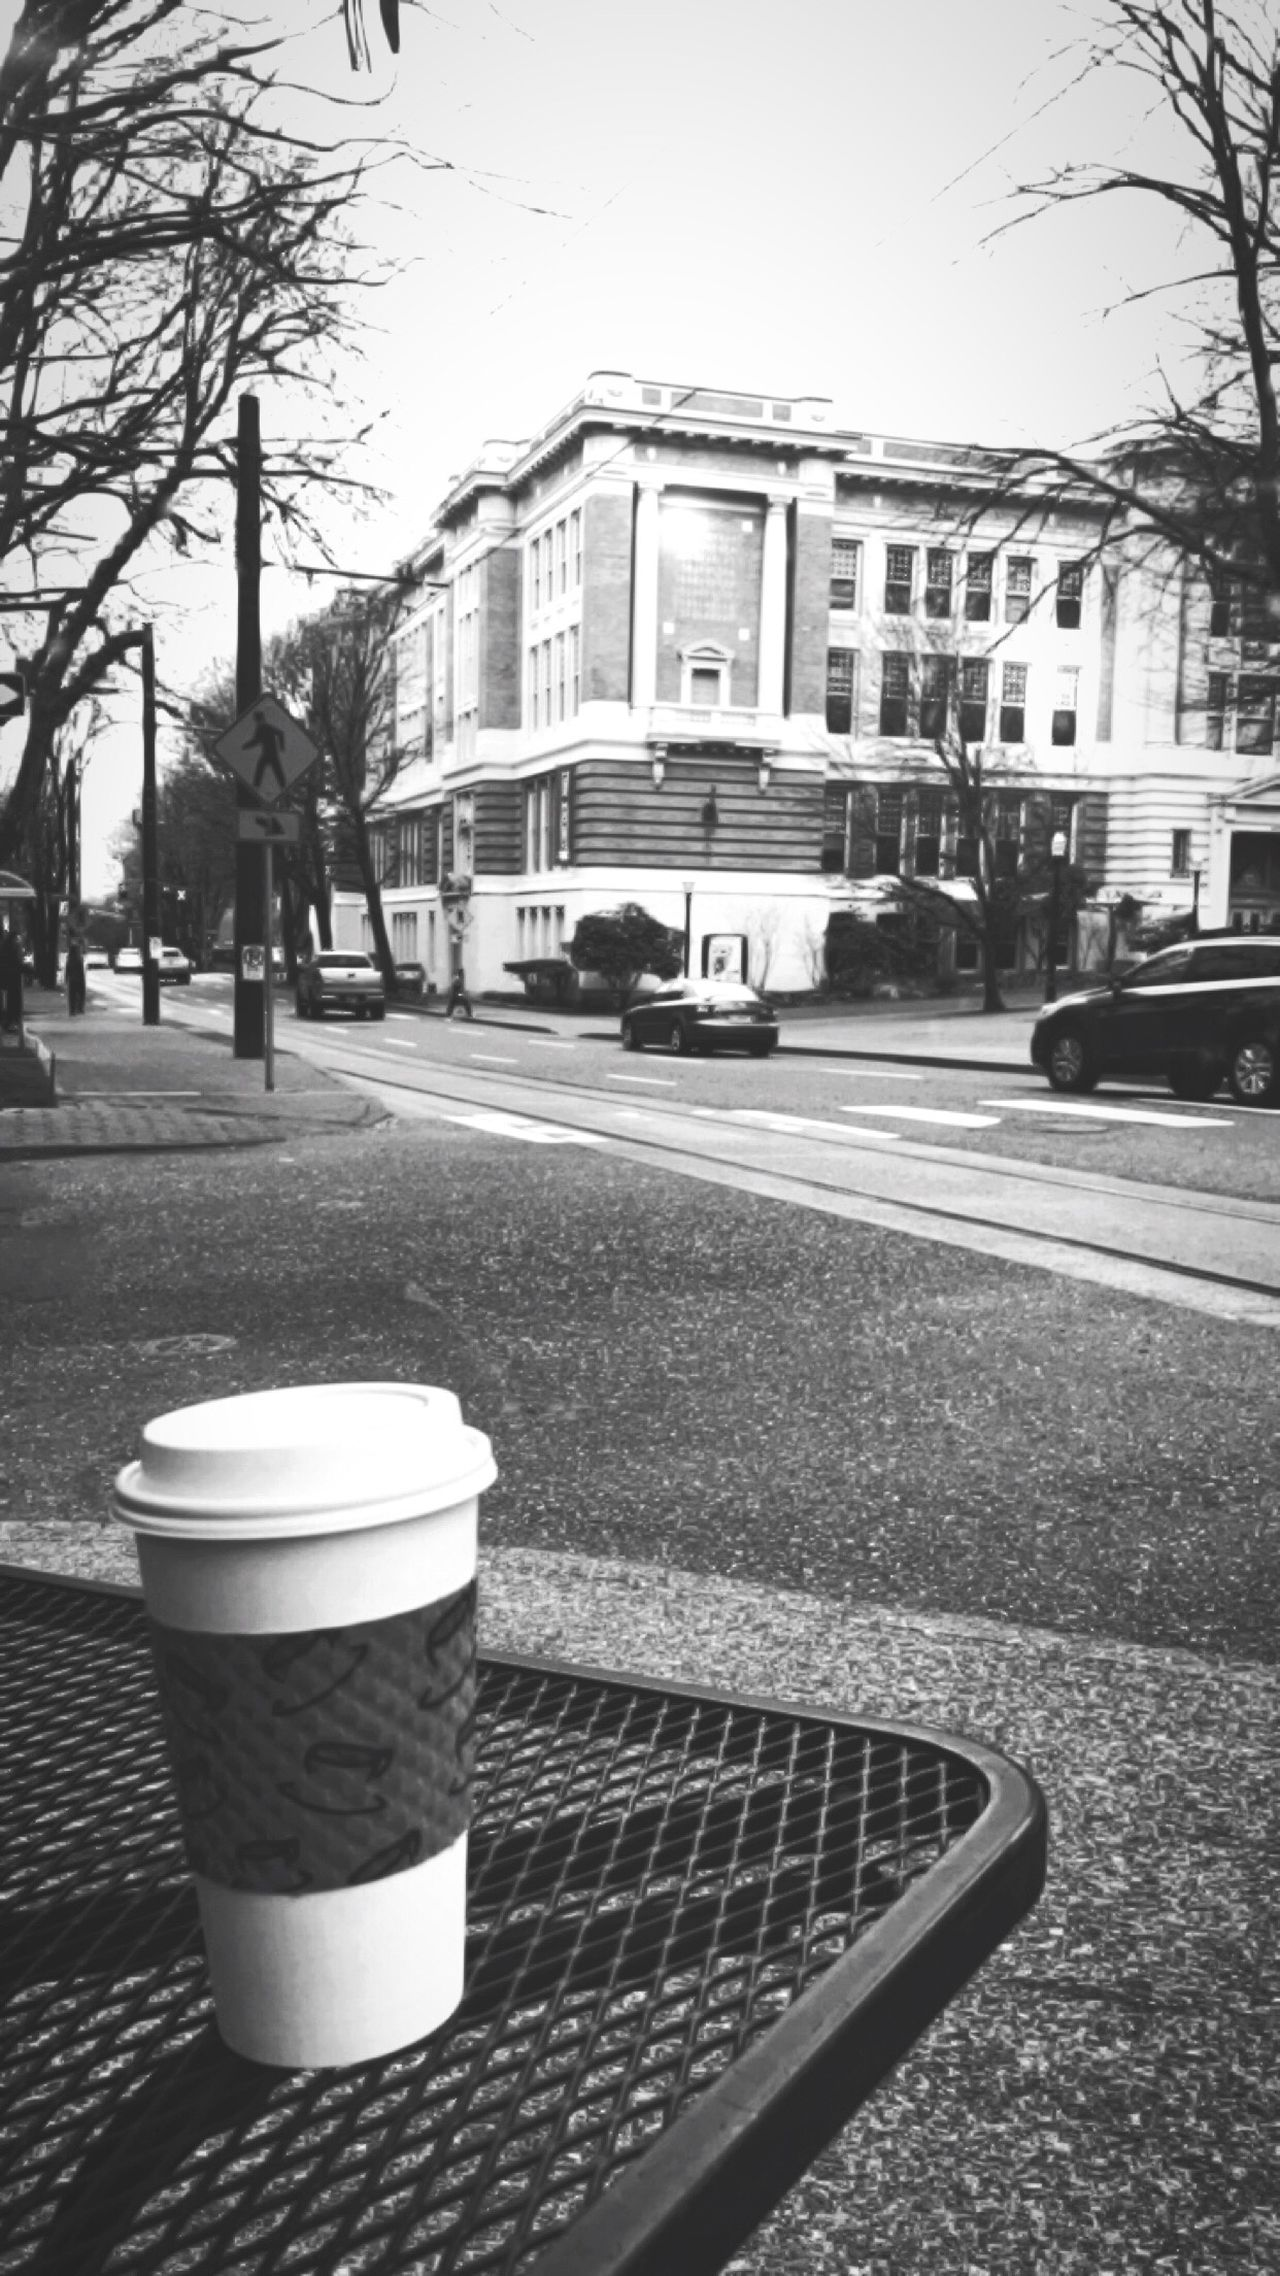 Lincoln Hall PSU Portland State University Portland Portland, OR Market Street Park Avenue Park Ave Park Avenue Cafe Coffee Coffee Time Blackandwhite Black And White Black & White Welcome To Black